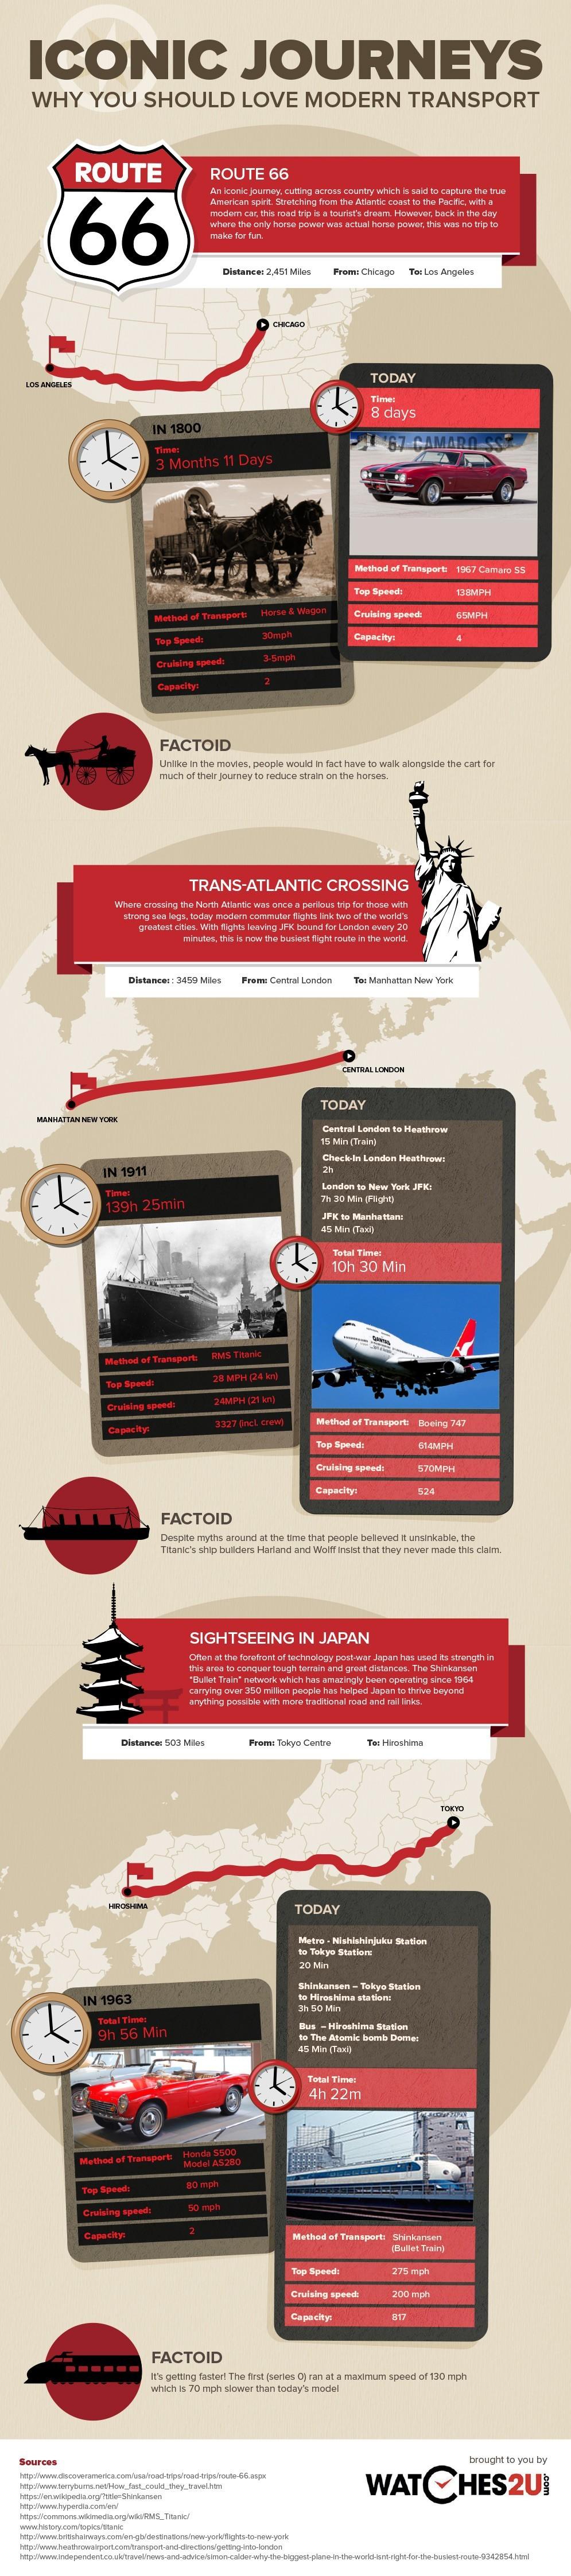 Iconic journeys - modern transport